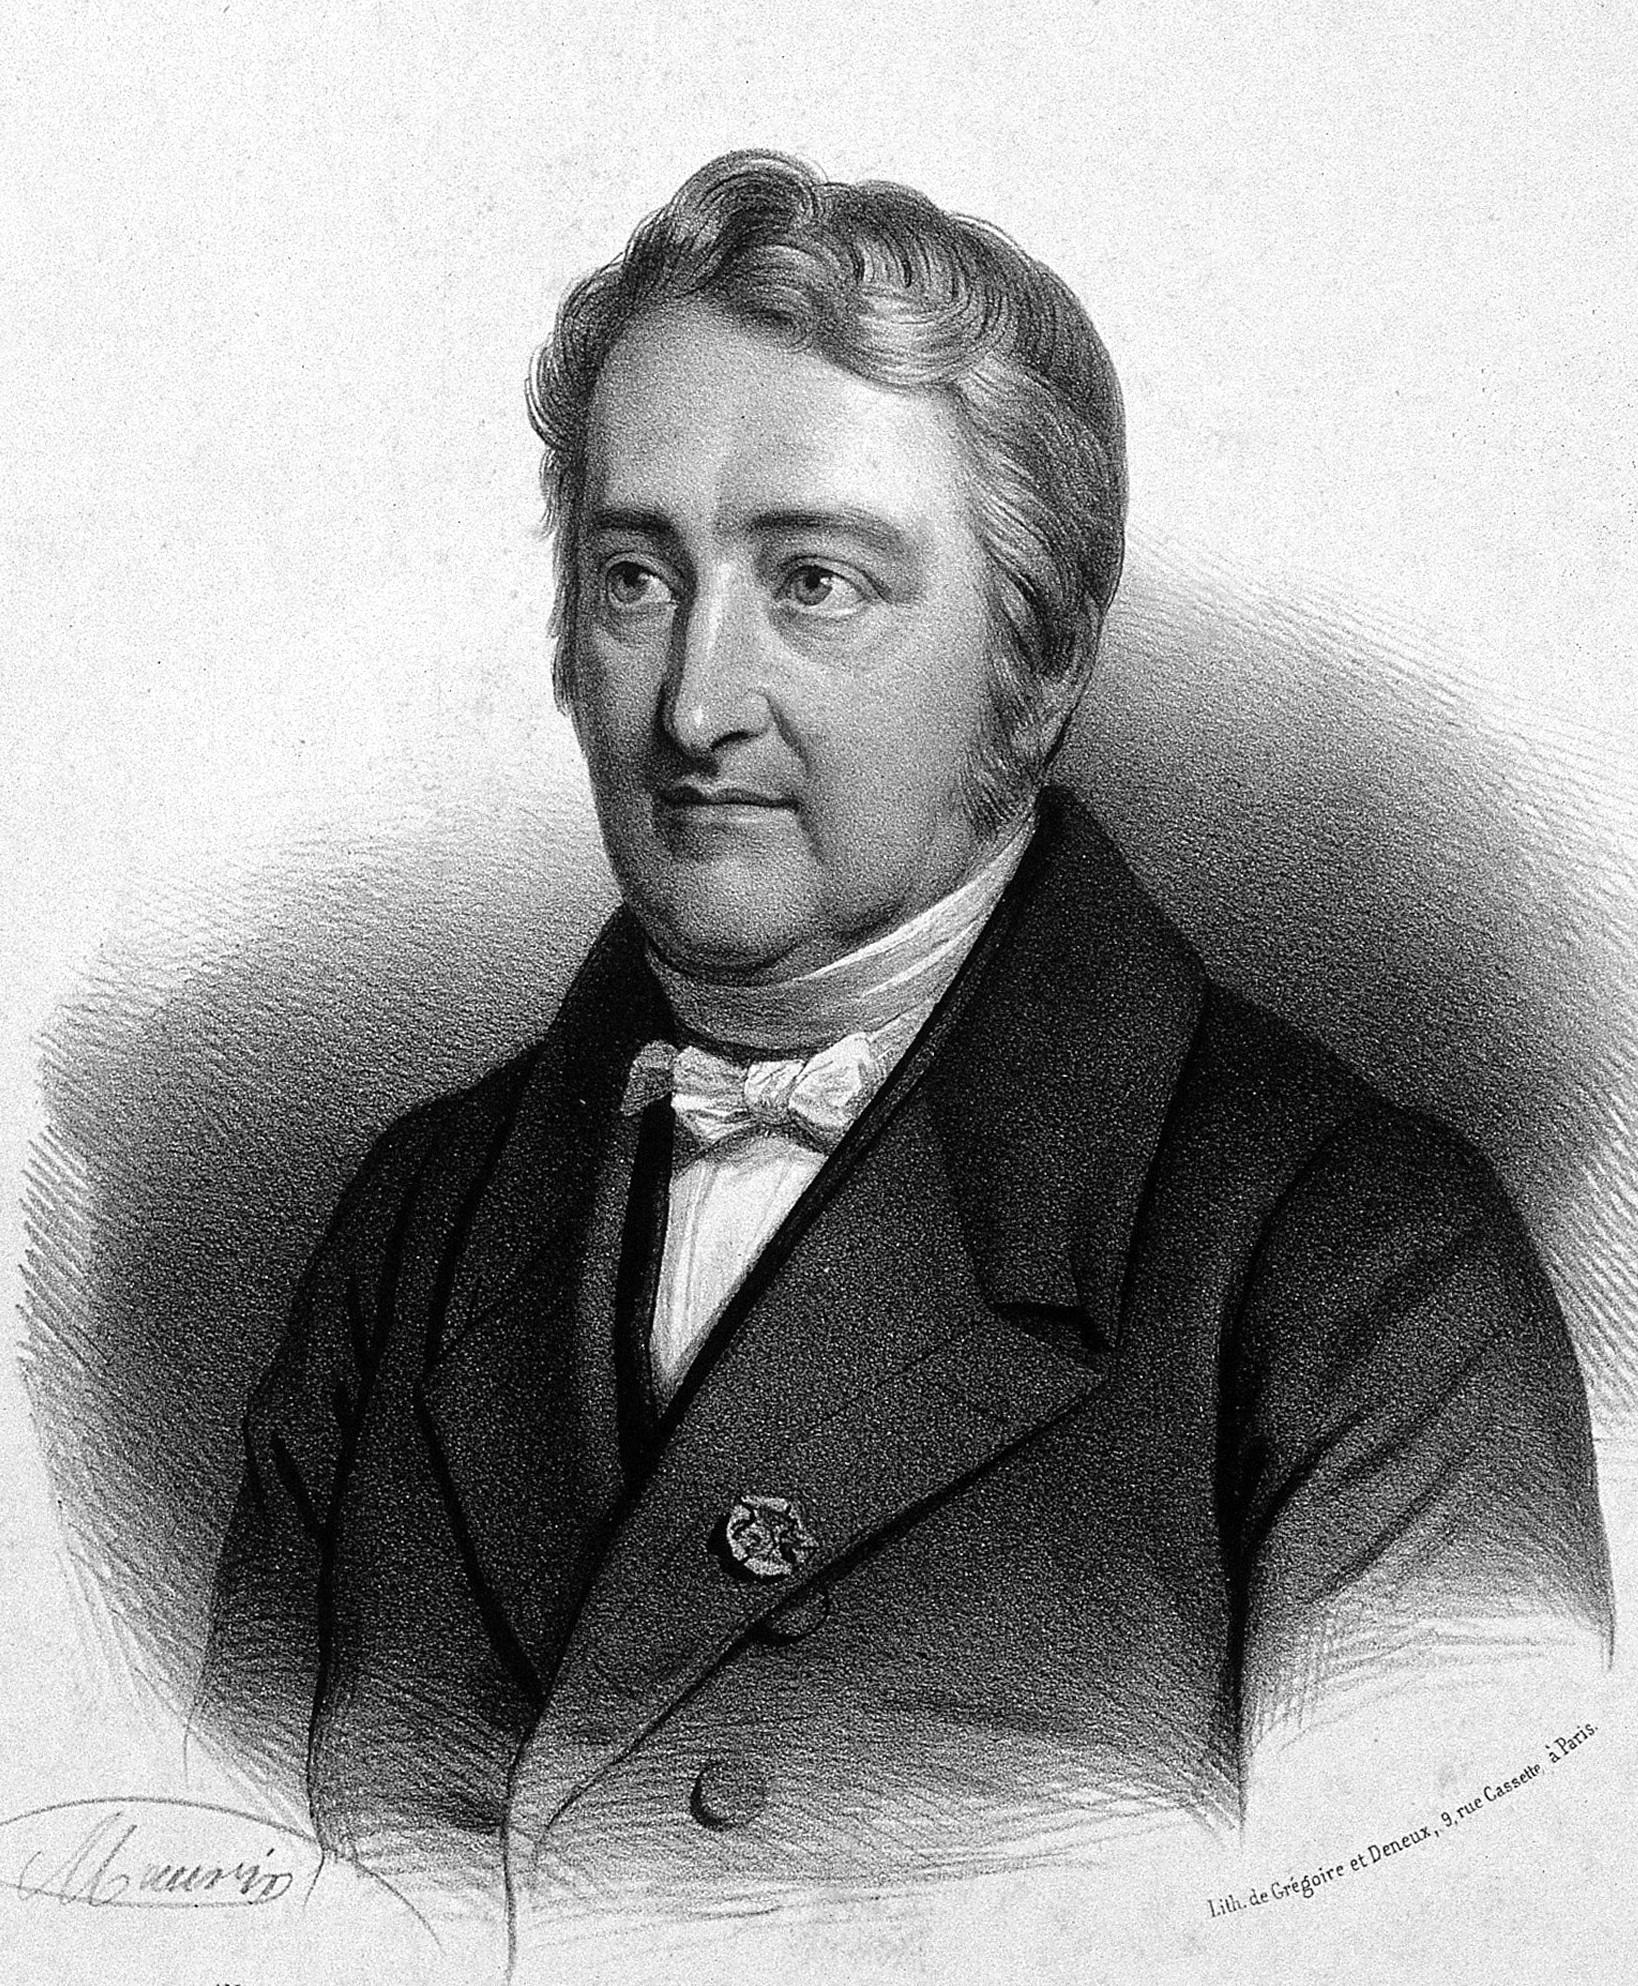 P.J. Pelletier